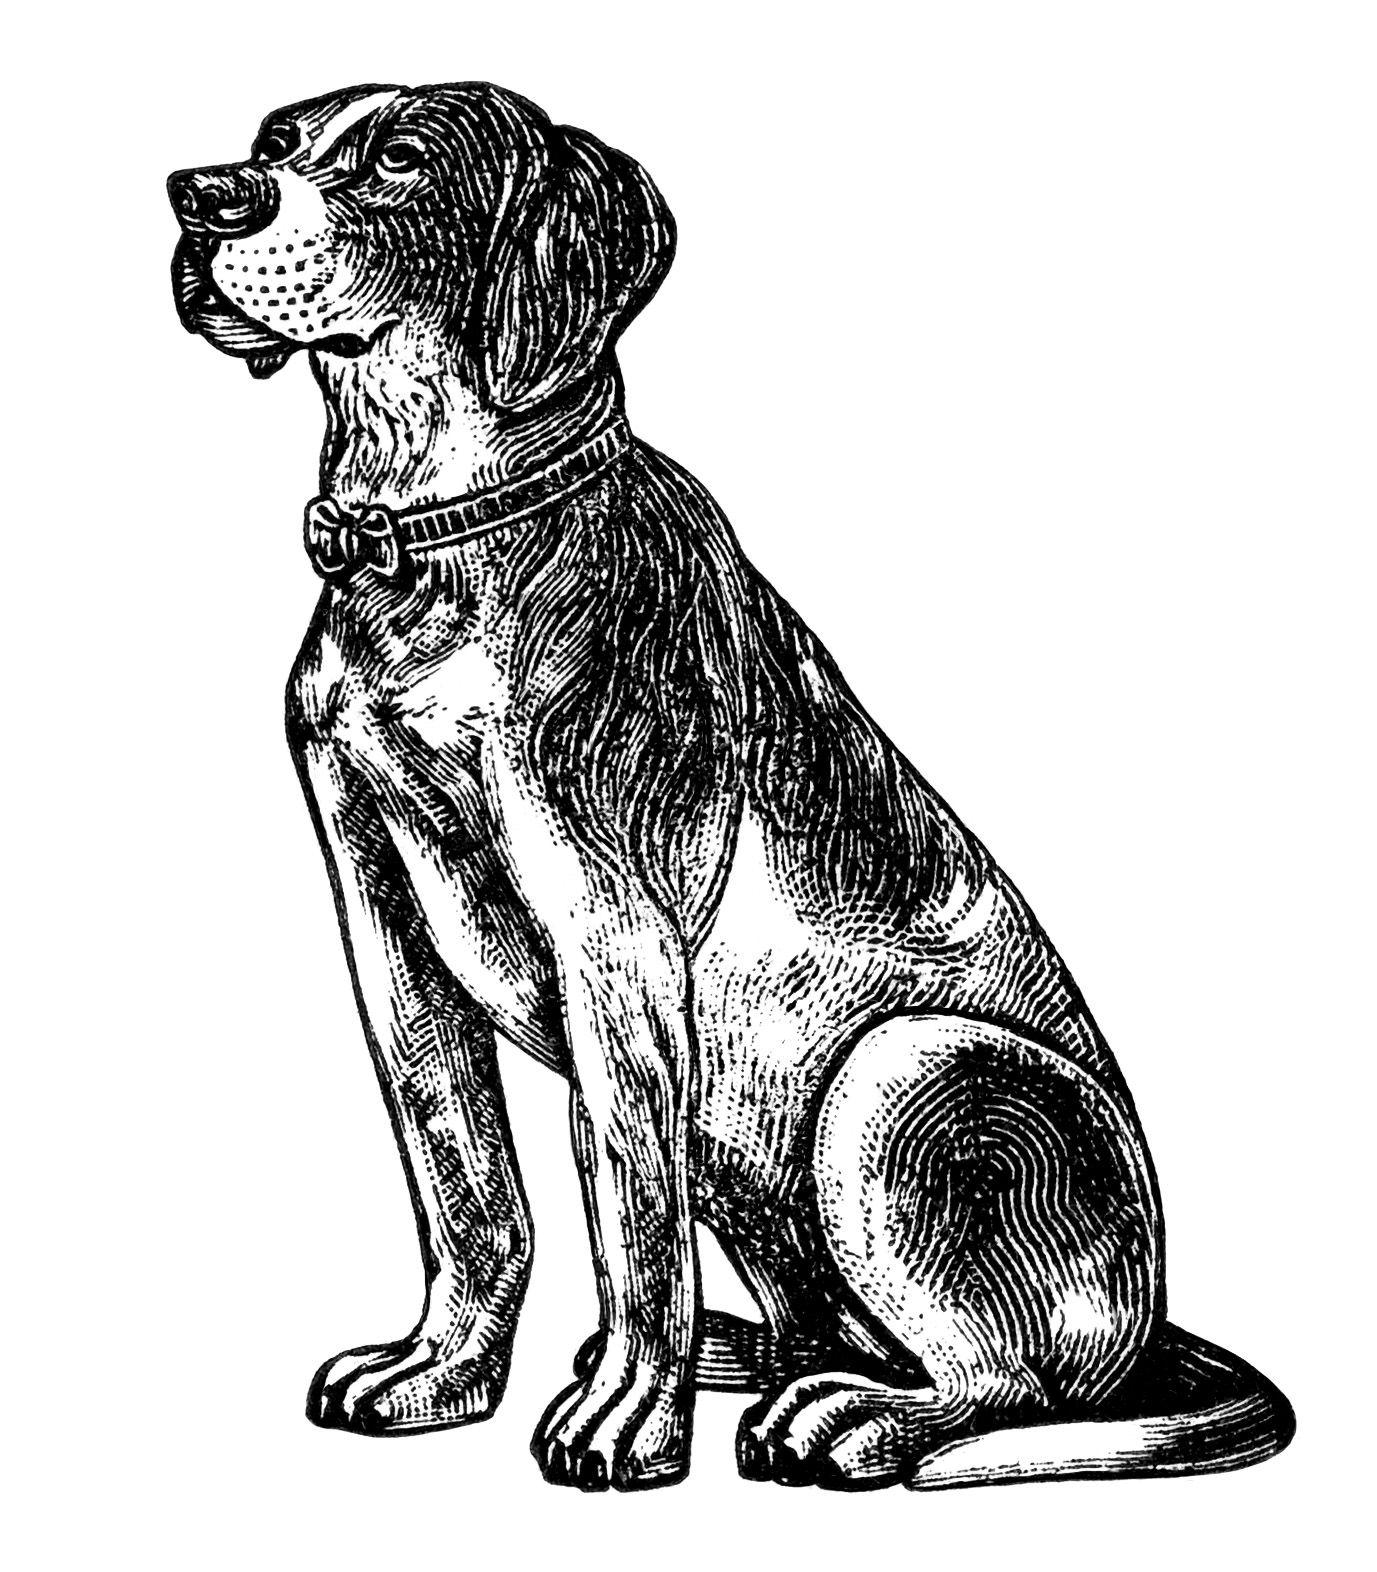 free vintage dog clipart black and white clip art digital pet ima rh pinterest com Dog Silhouette Clip Art free black and white dog and cat clipart